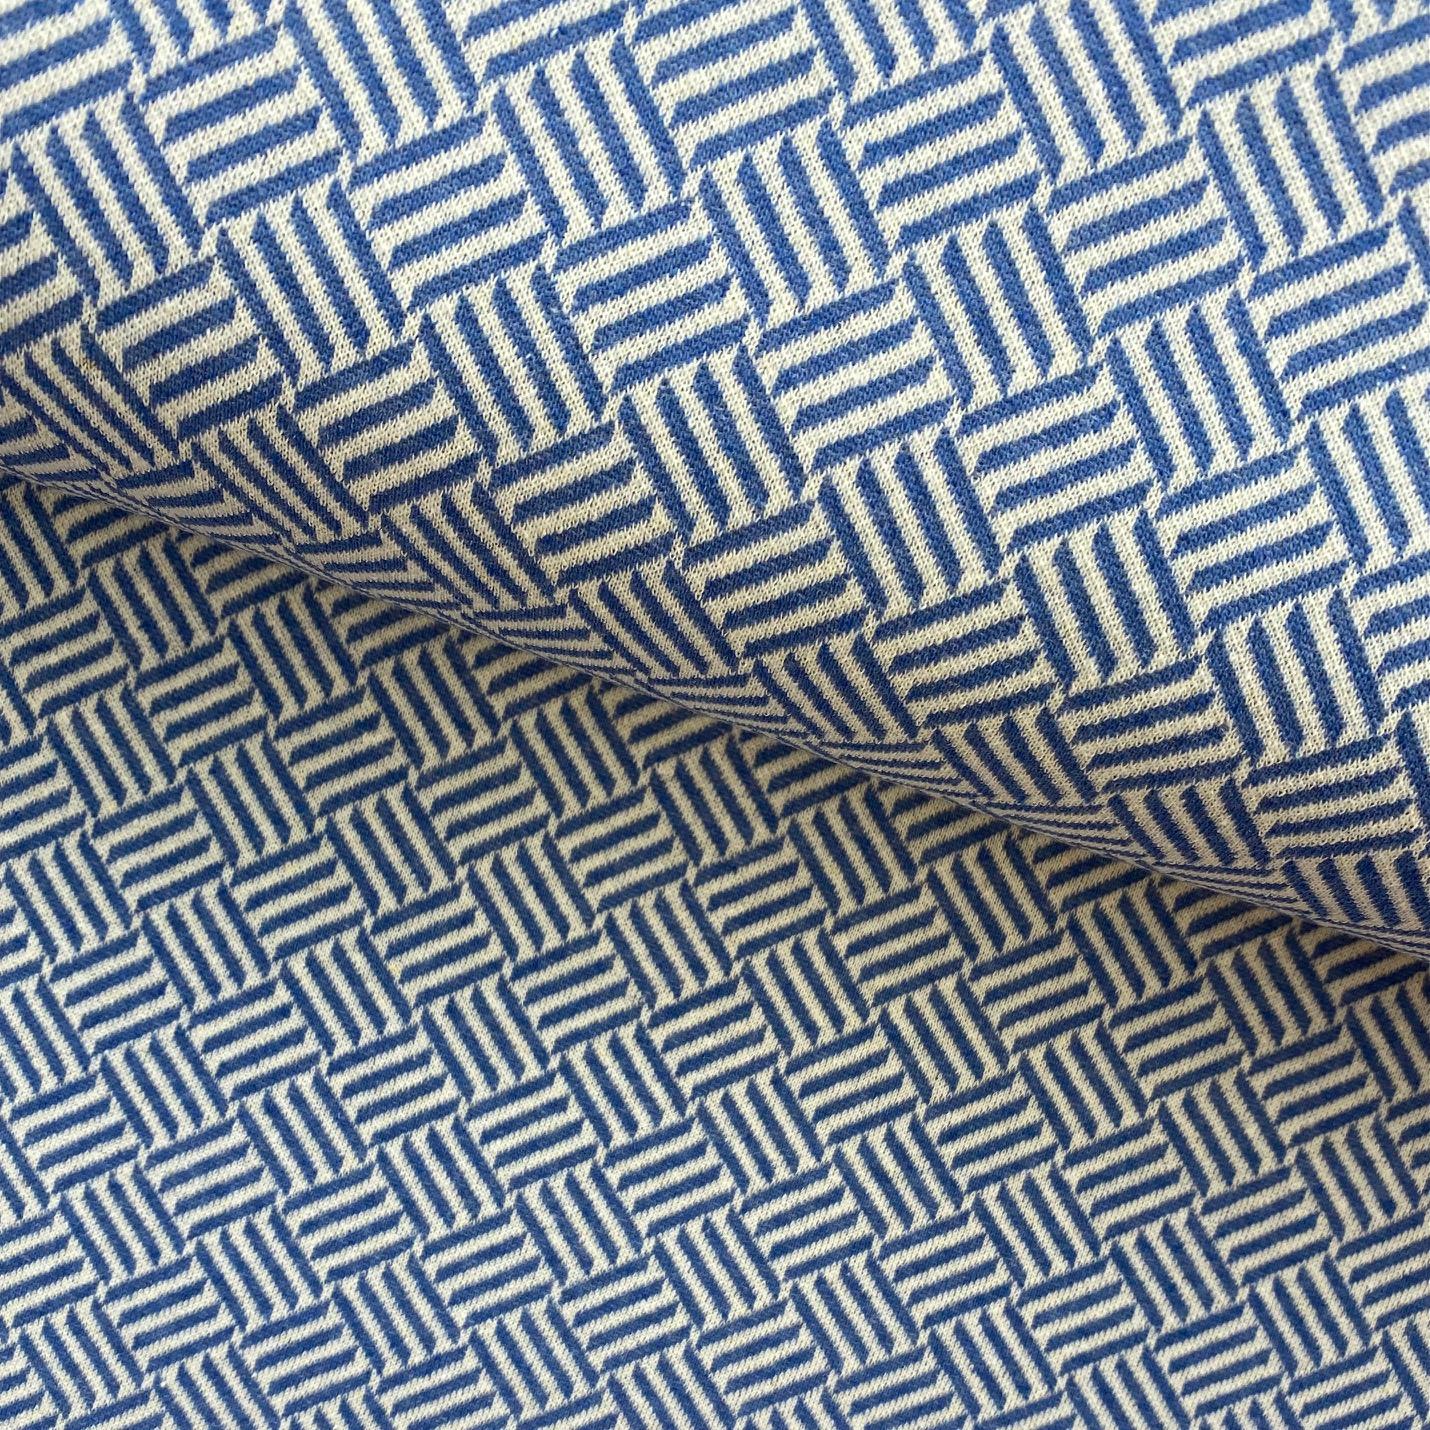 Strick Jacquard aus recycelter Baumwolle, blau. Art. 319016.42